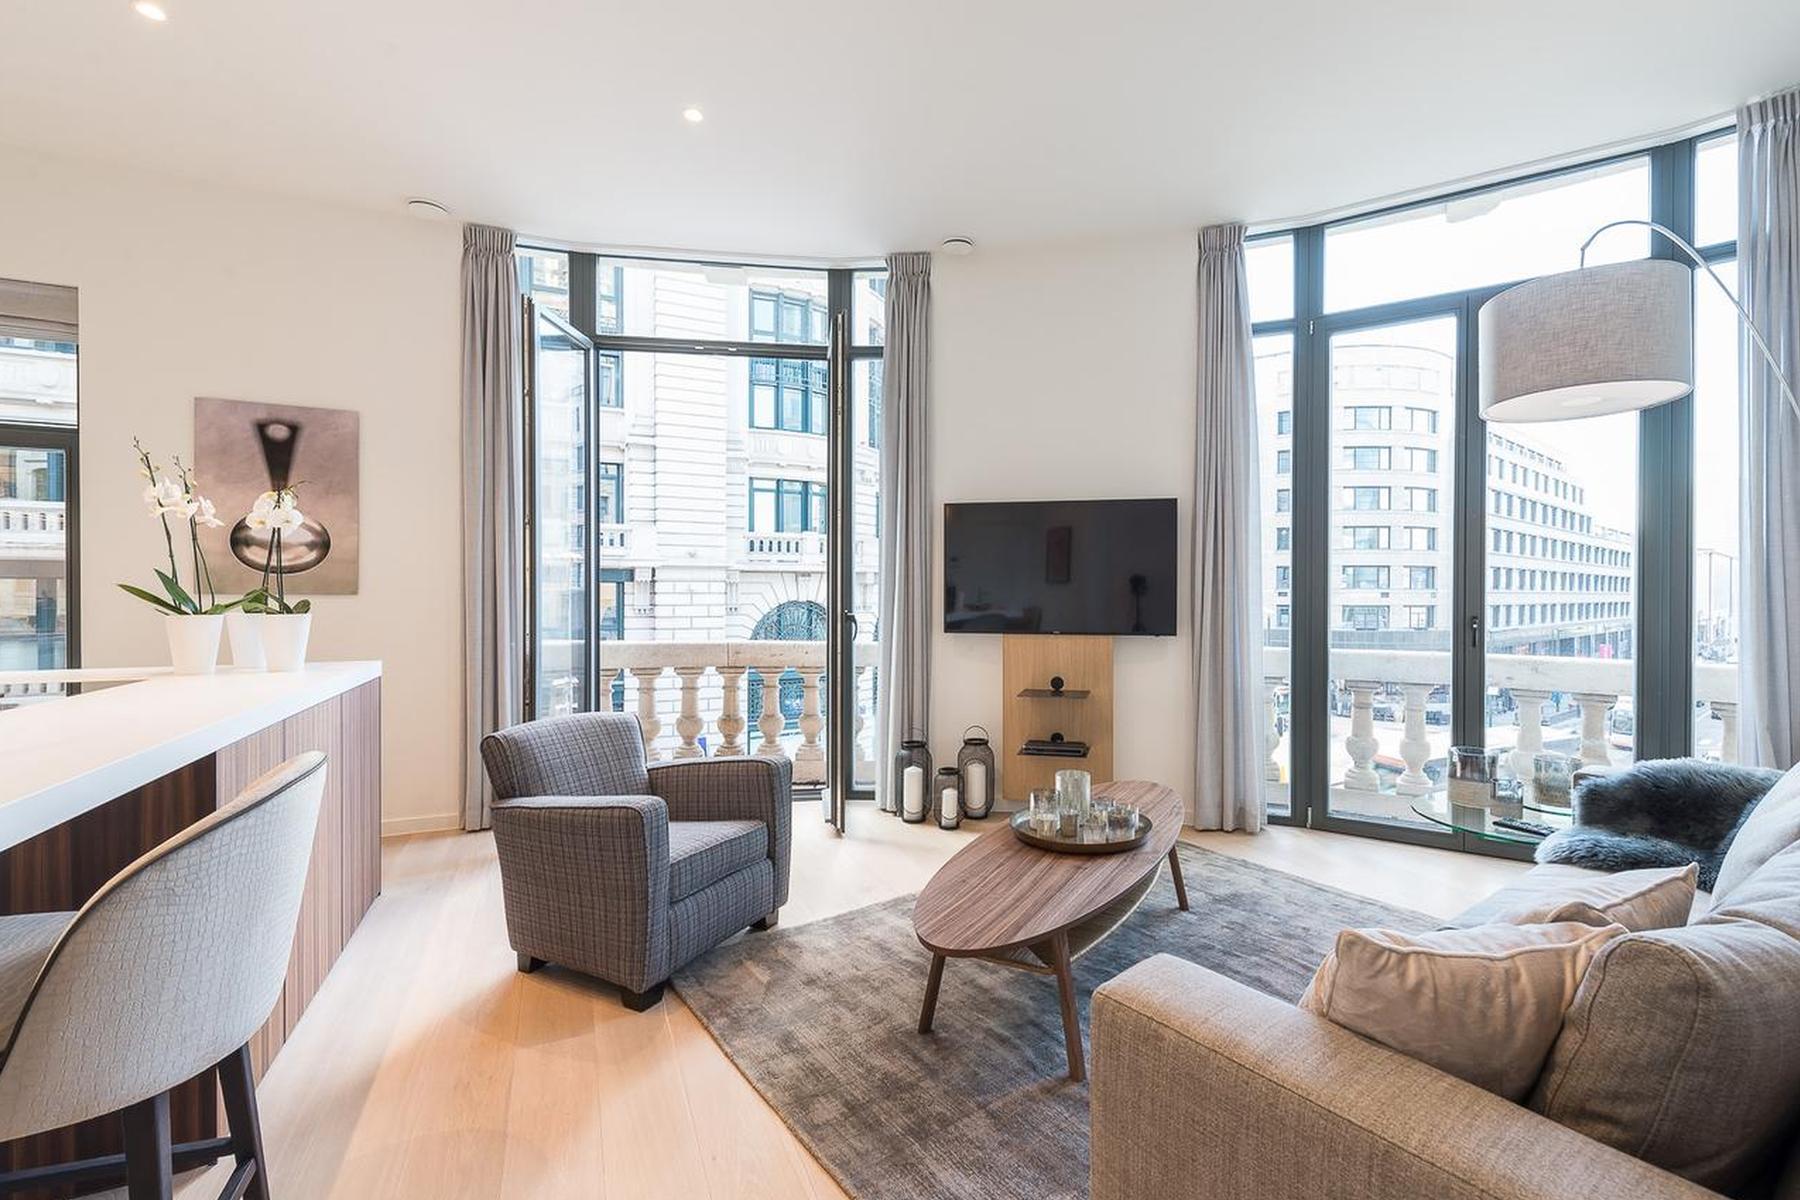 Apartment for Rent at Bruxelles I Appart-Hôtel I Parc Royal 2 Rue des Colonies Brussels, Brussels 1000 Belgium